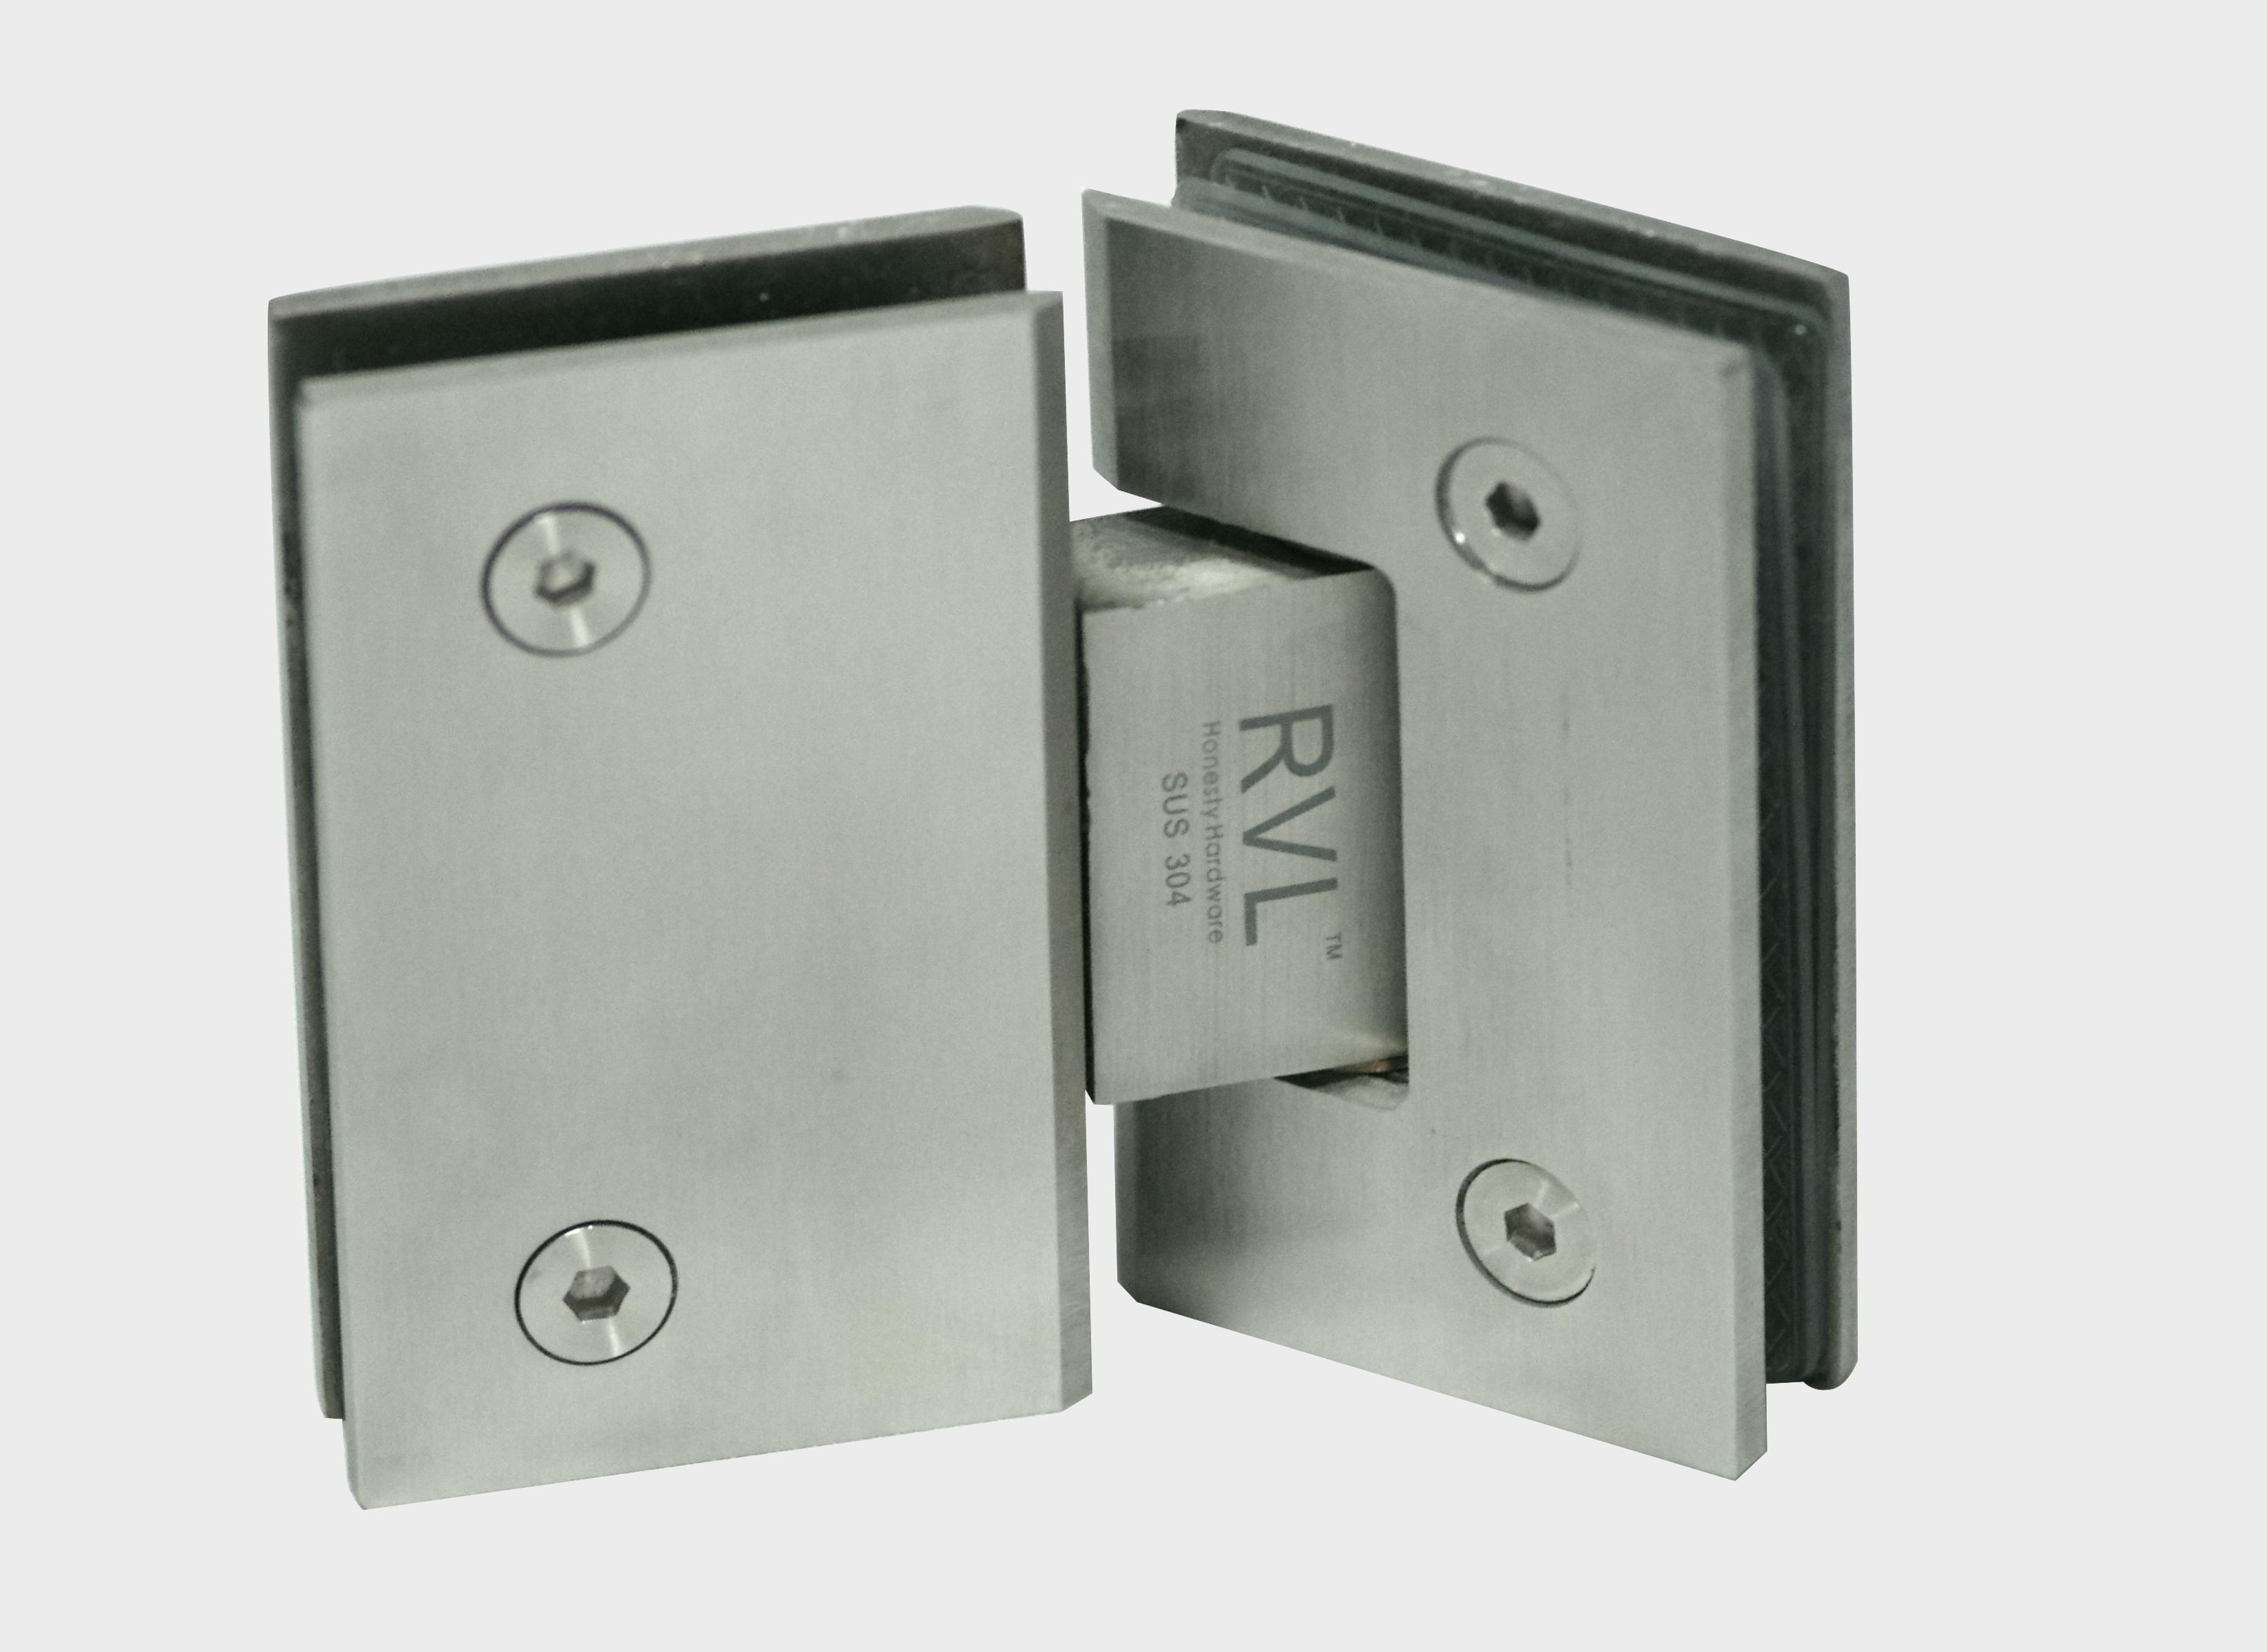 浴室夹 RVL-BS2-Z